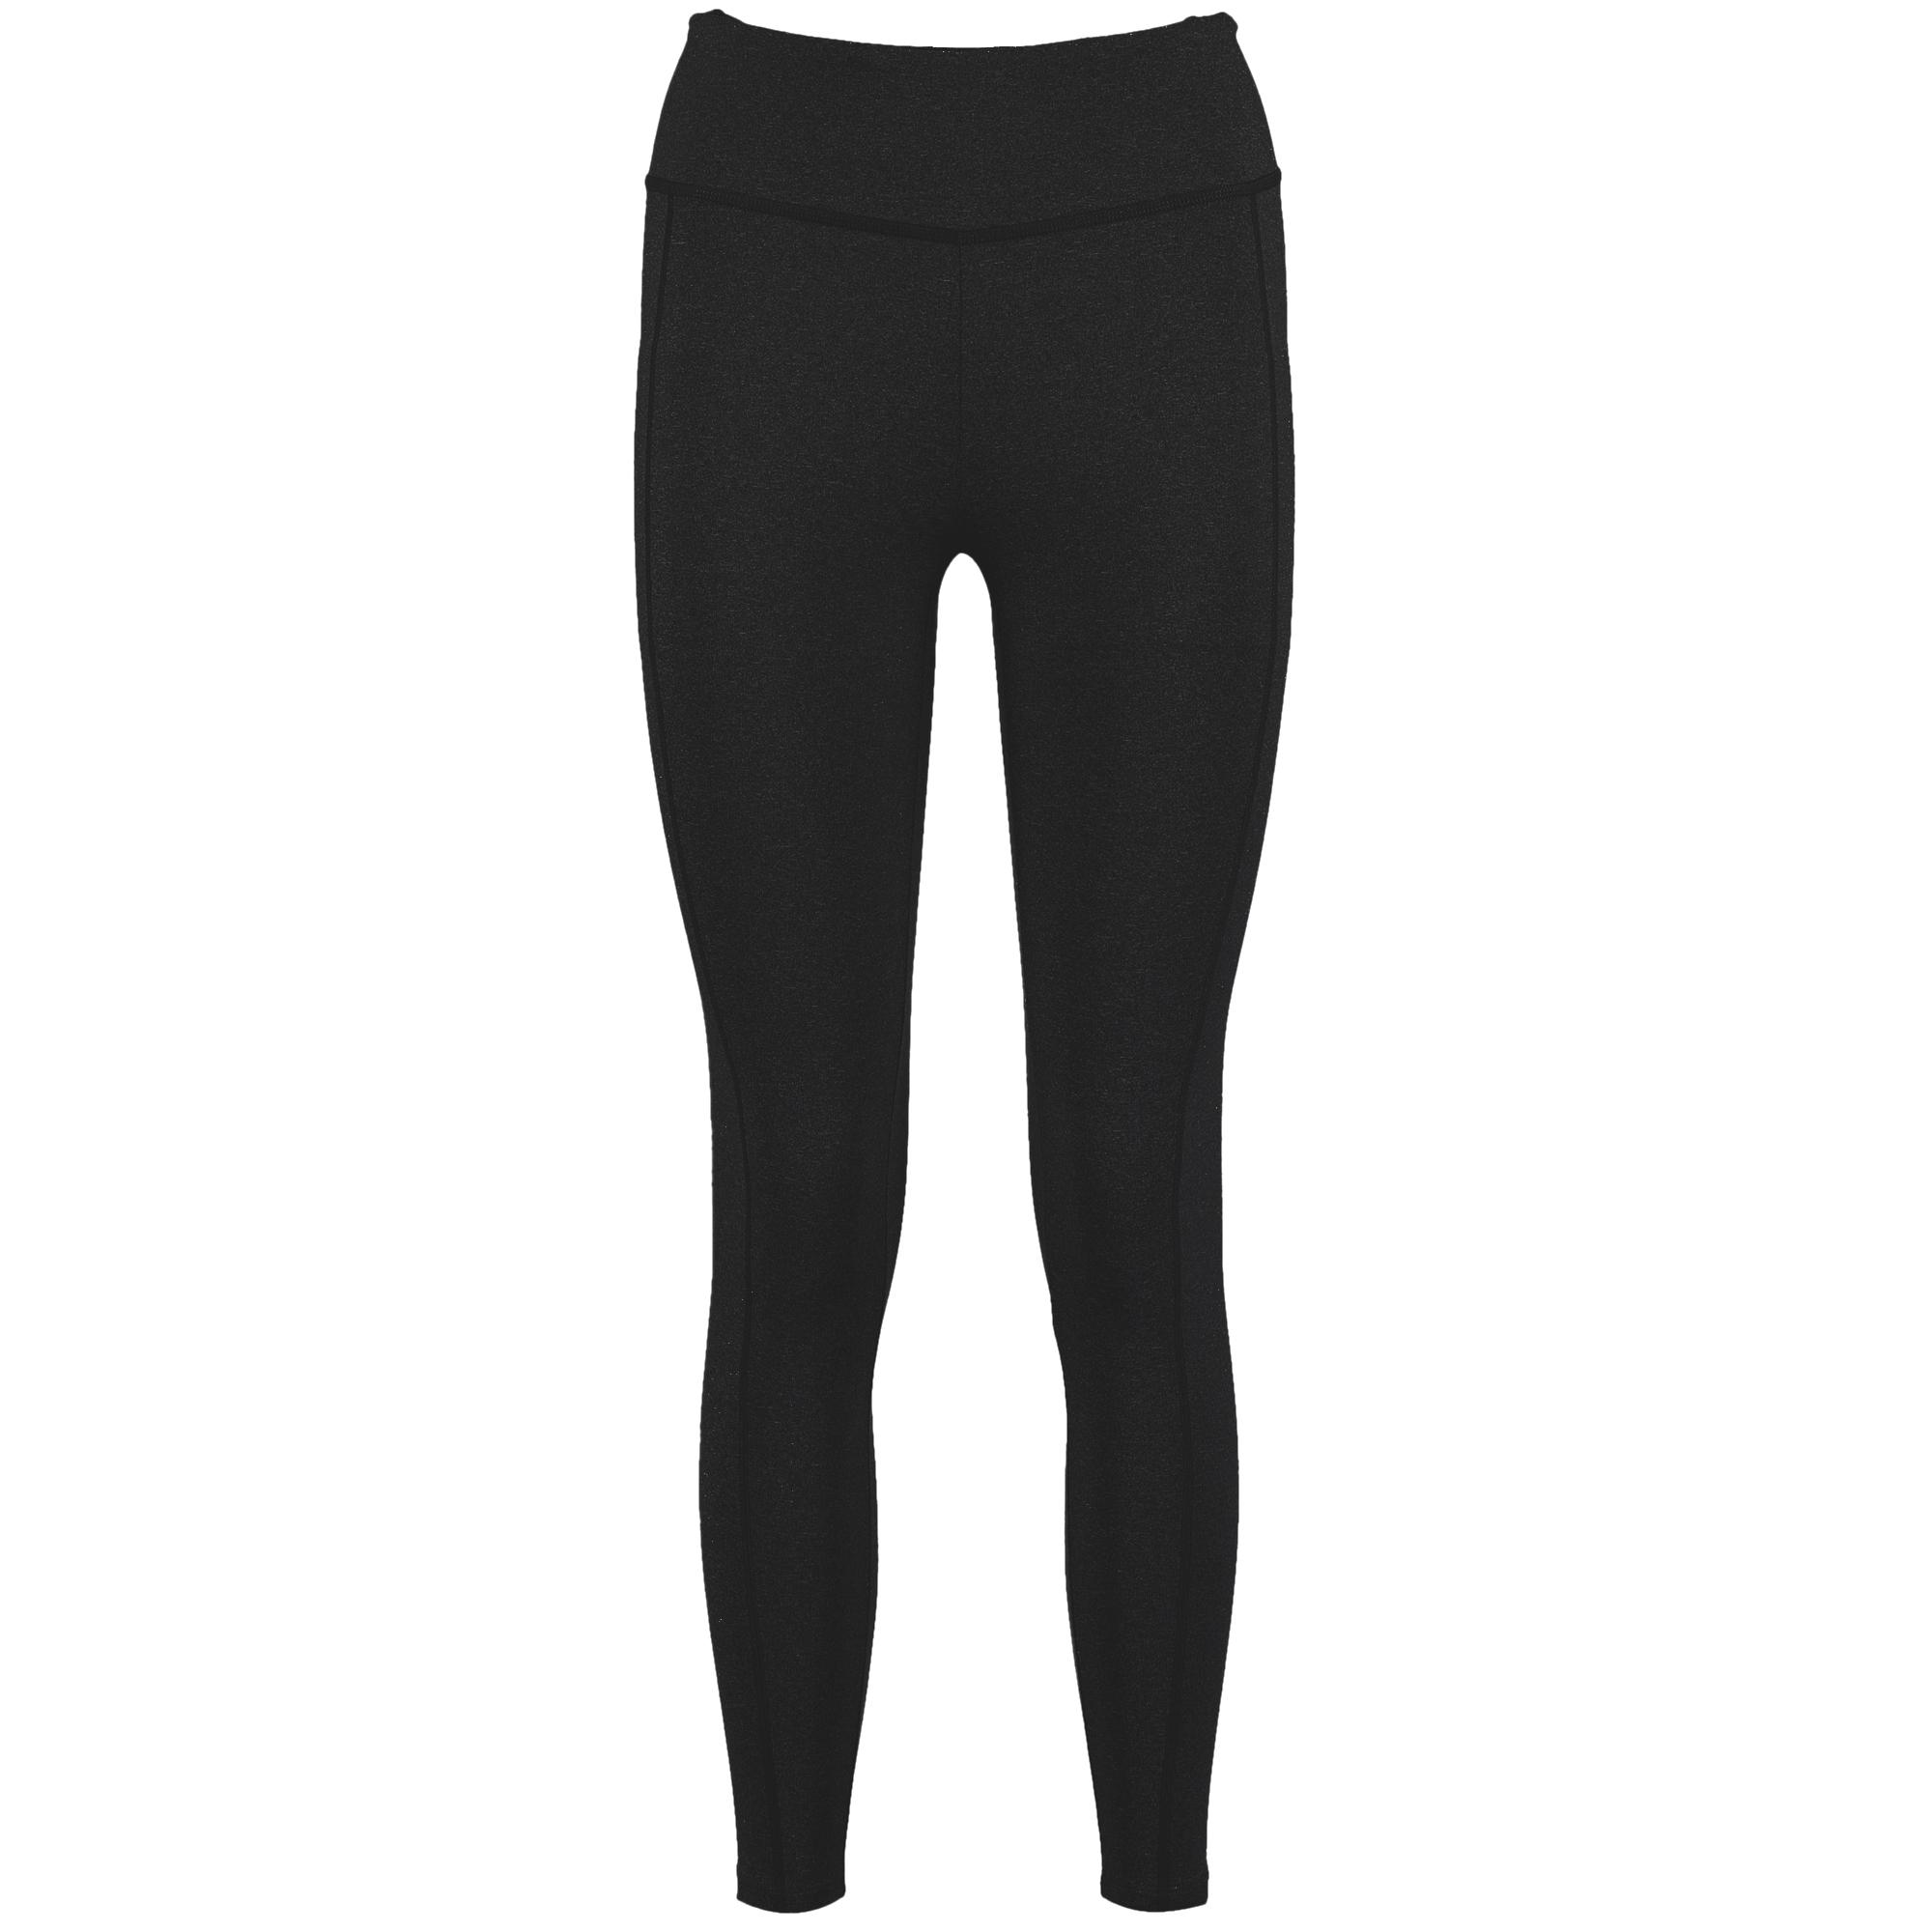 Gamegear Womens/Ladies Full Length Athletic Leggings (12 UK) (Black)